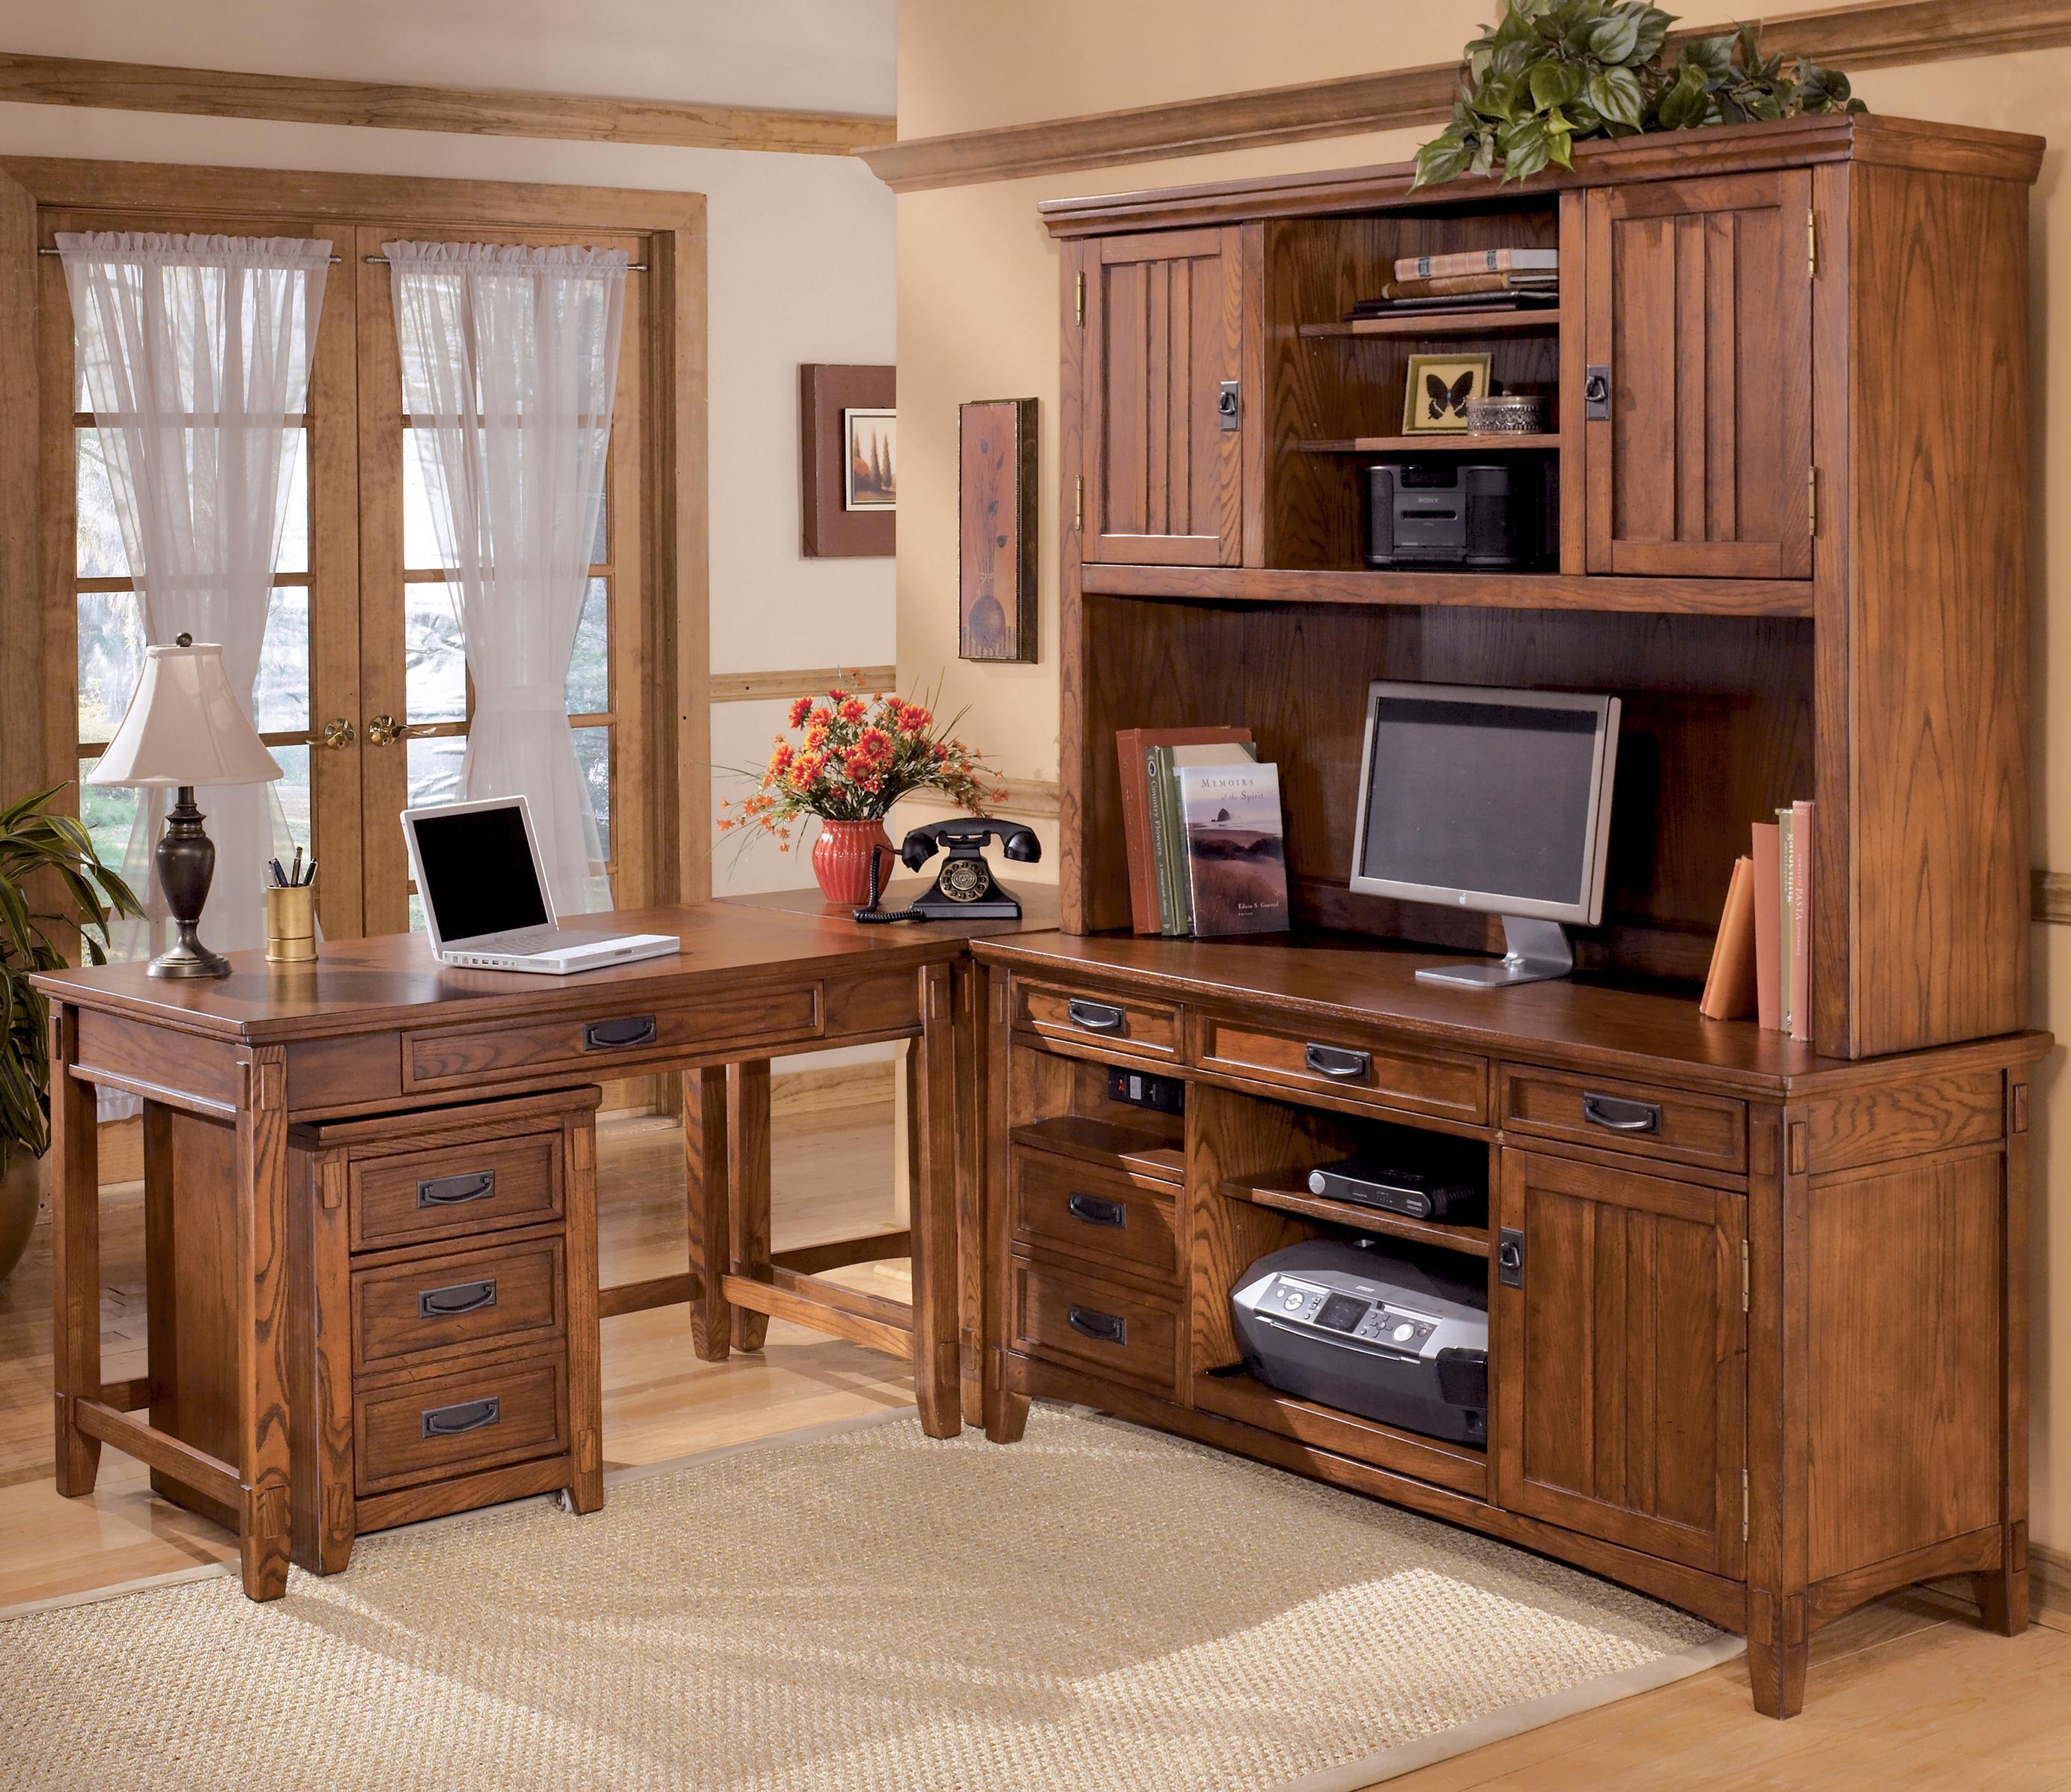 Ashley Furniture Cross Island 5 Piece L-Shape Desk Unit with Hutch ...